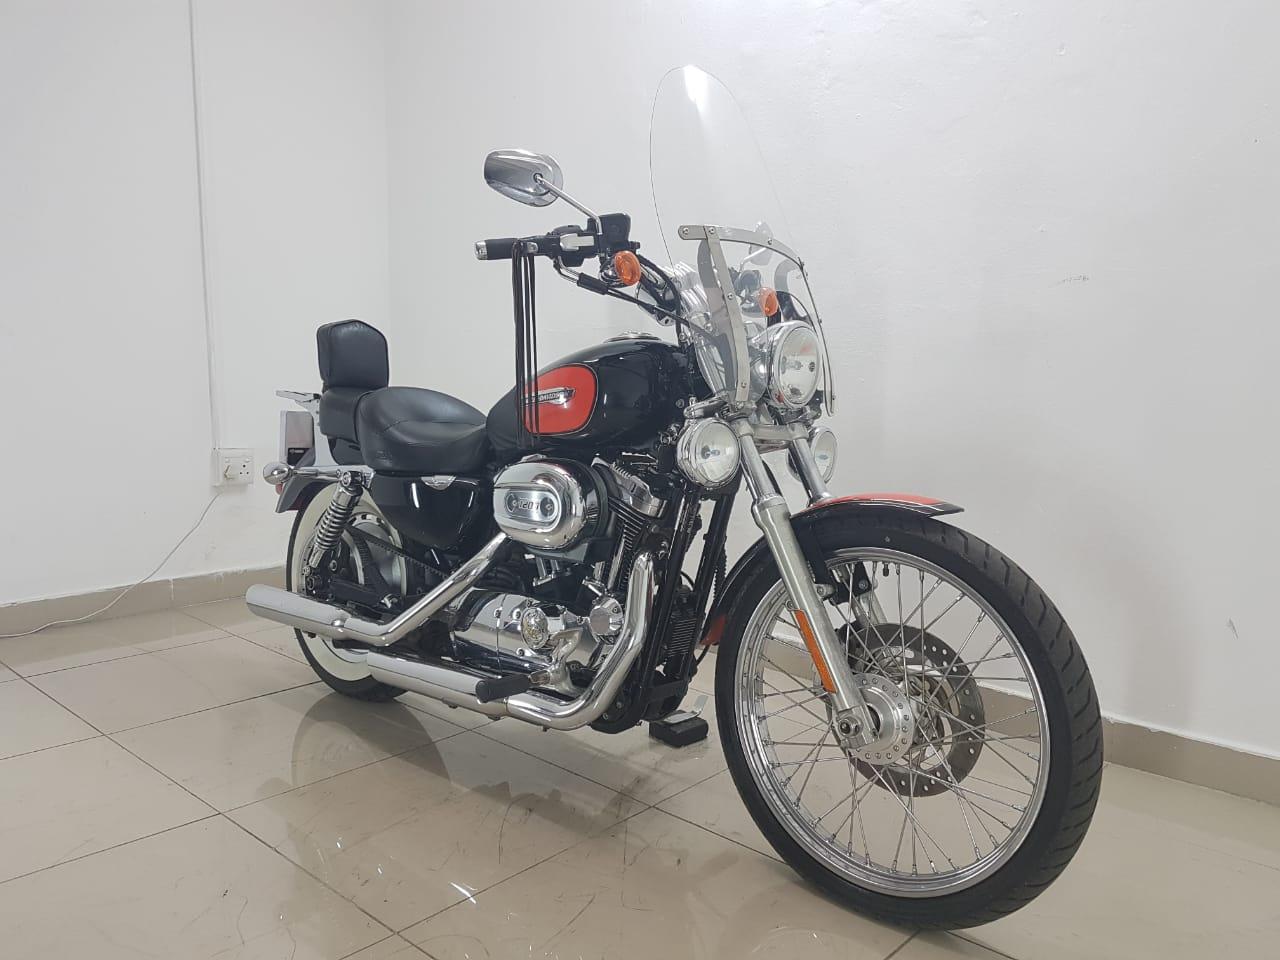 2008 Harley Davidson XL1200